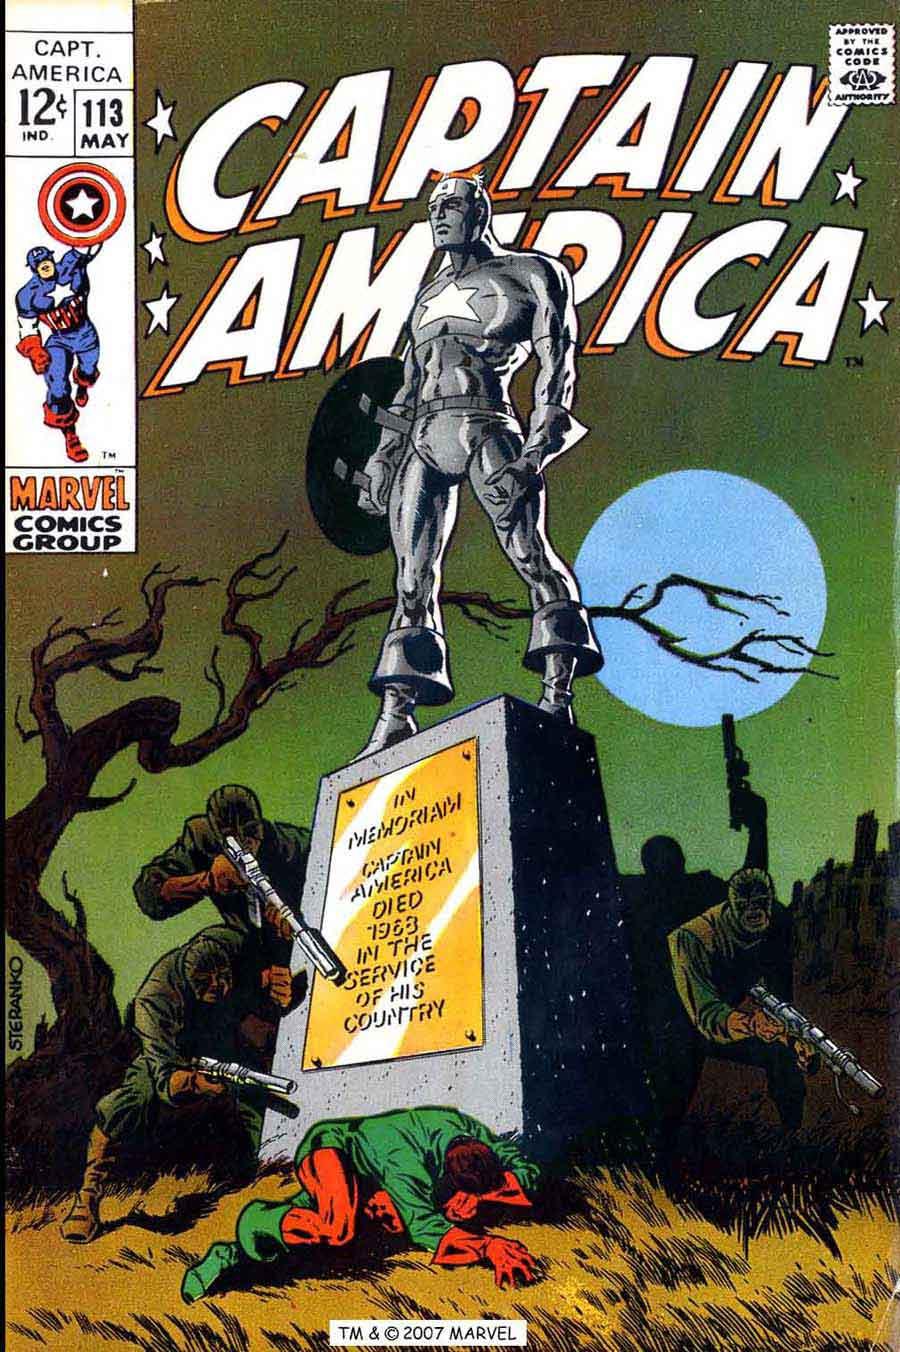 Marvel Comic Book Cover Art : Captain america jim steranko art cover pencil ink